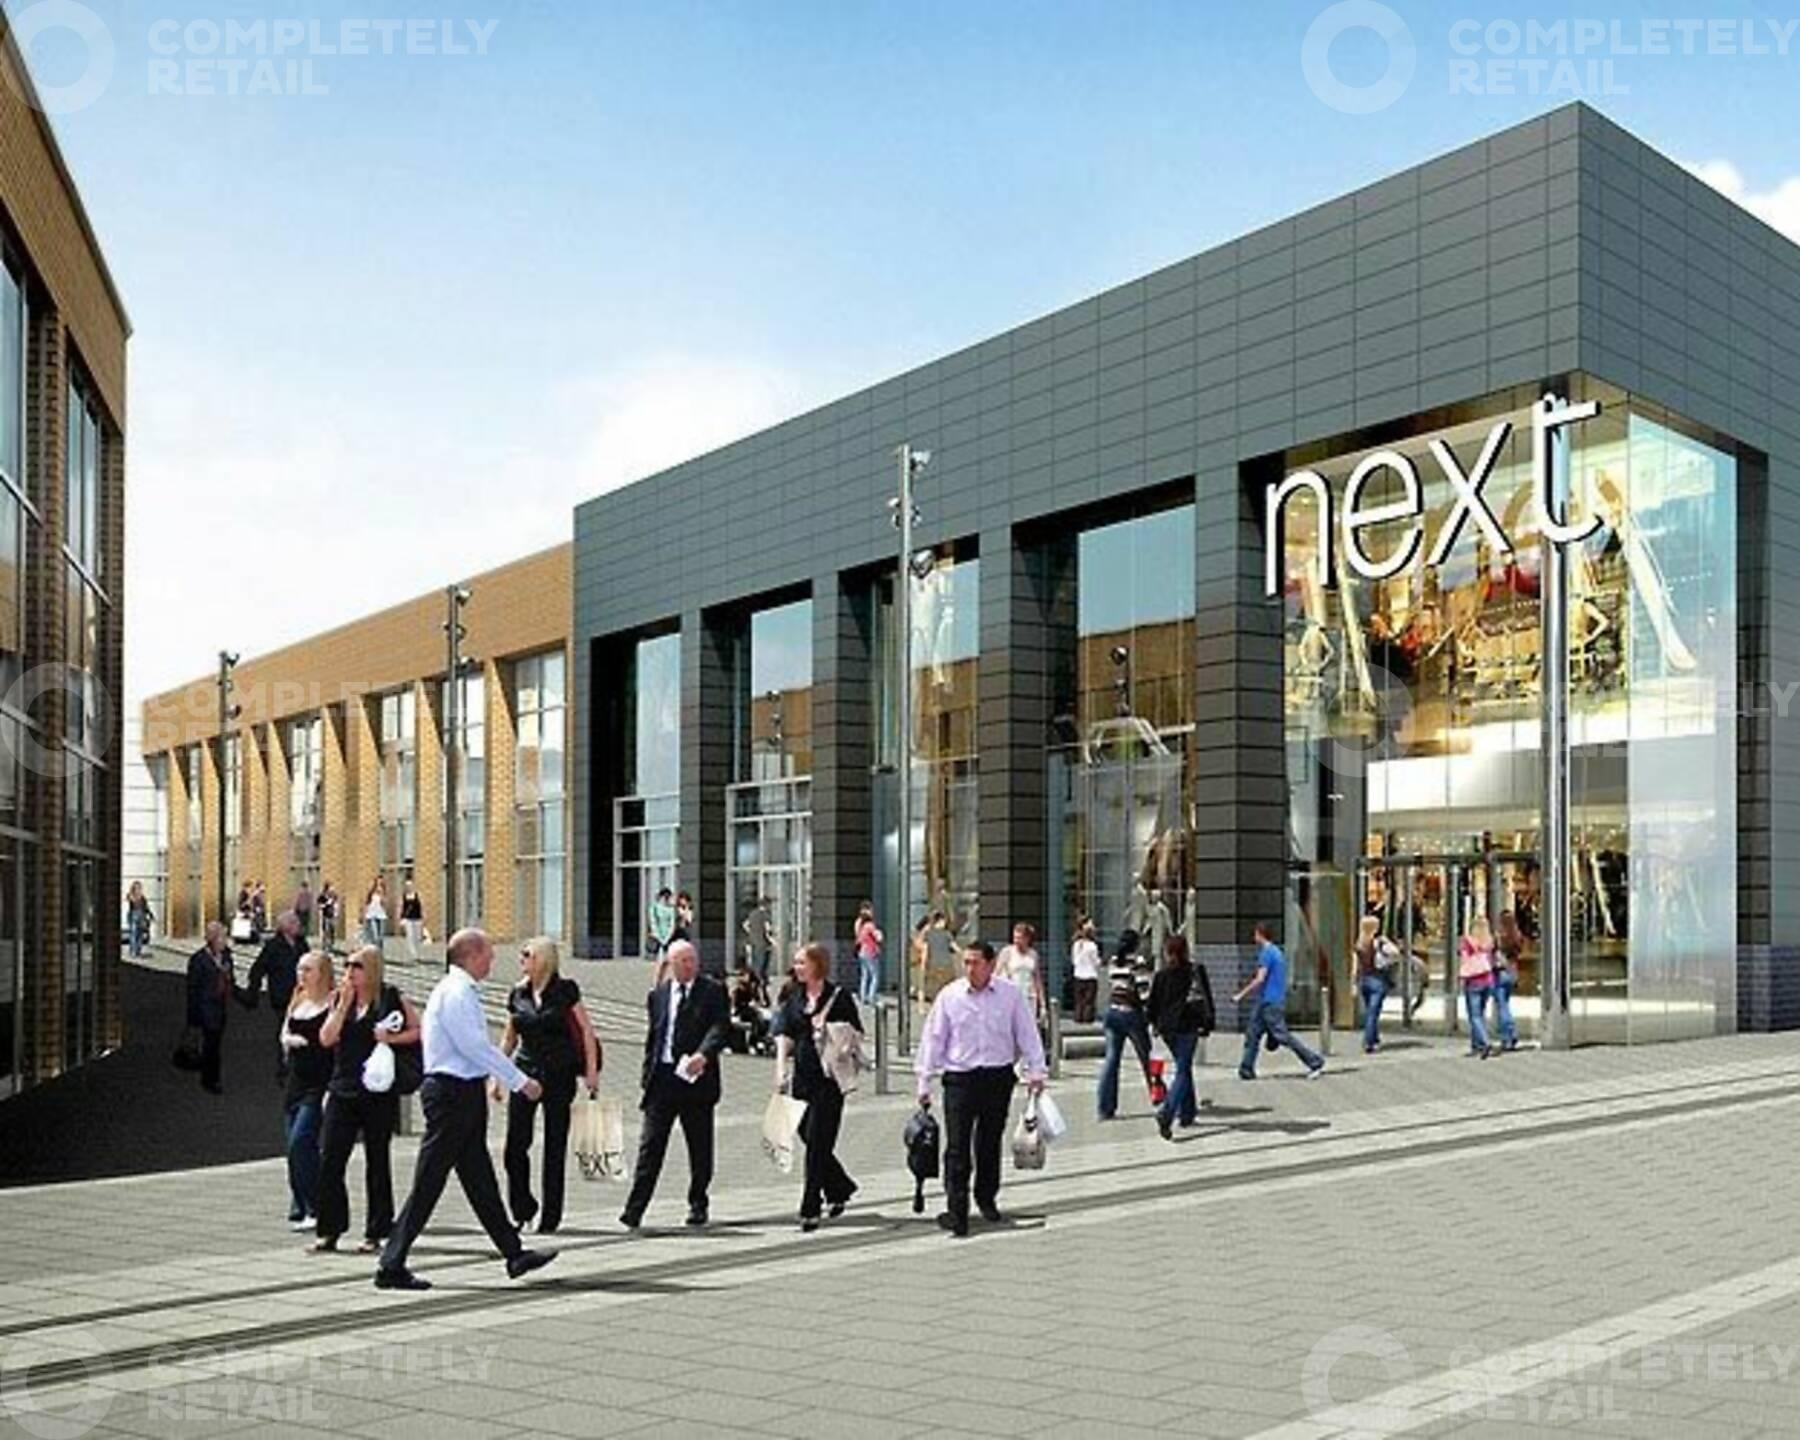 Burnley Town Centre redevelopment